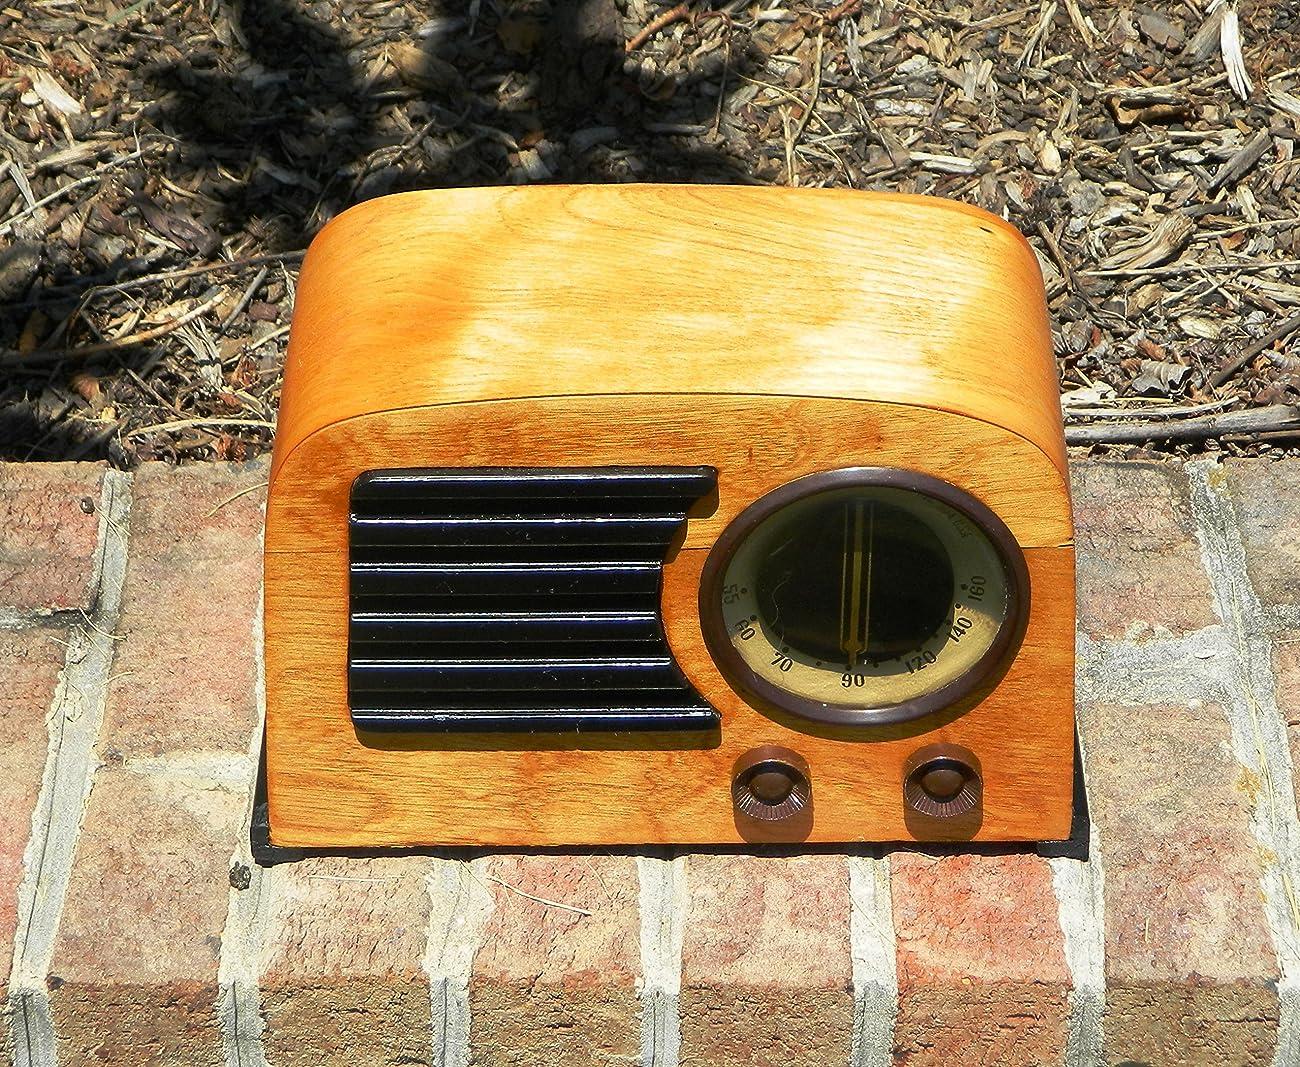 Working Antique 1946 Emerson AM Radio Model 544 1